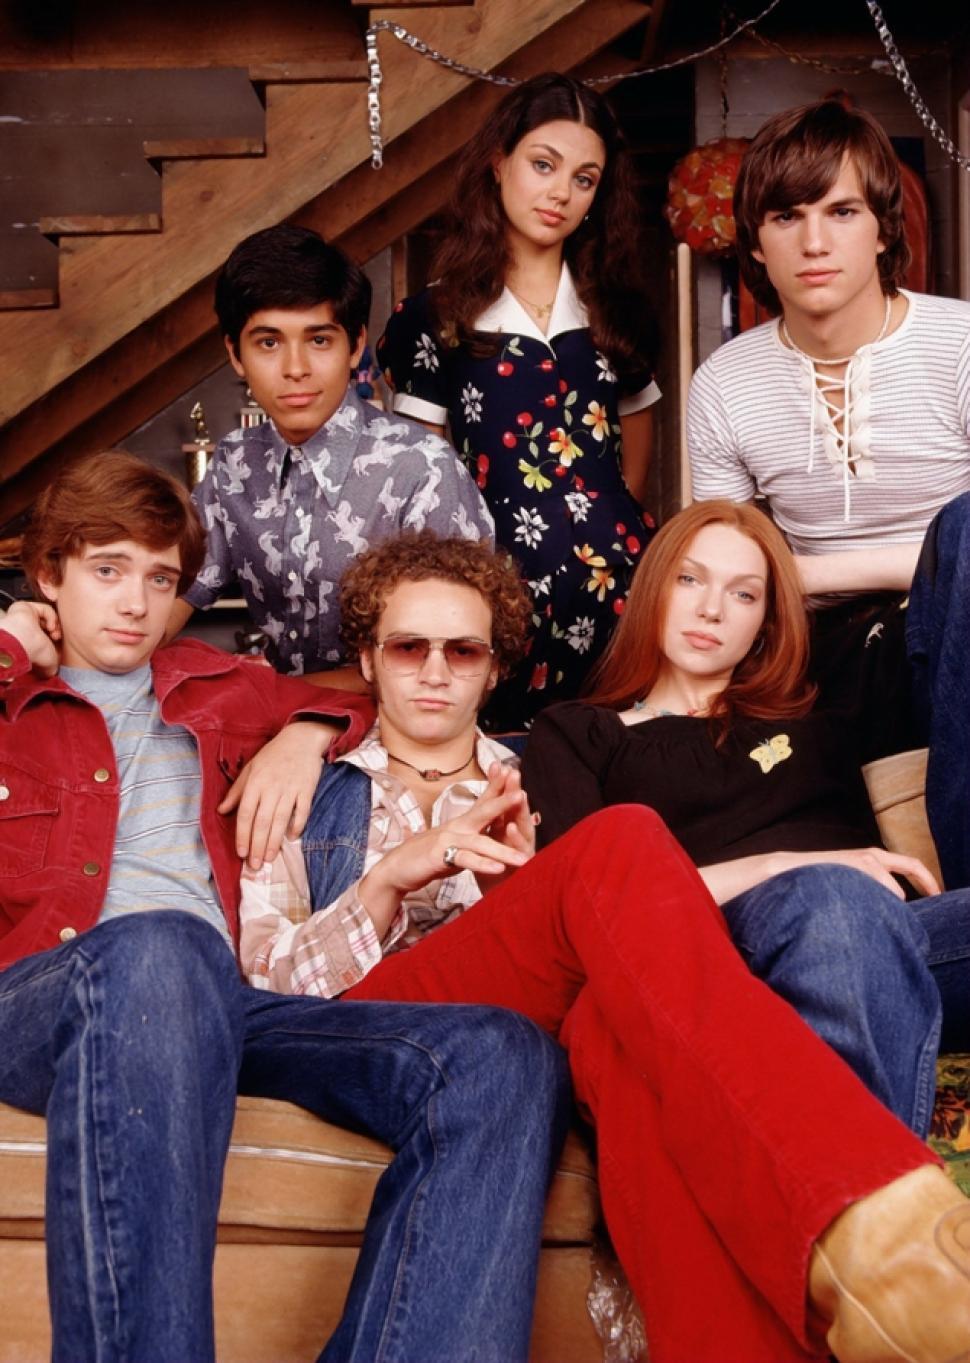 http-::www.nydailynews.com:entertainment:gossip:mila-kunis-ashton-kutcher-reunite-70-show-costars-article-1.1480709